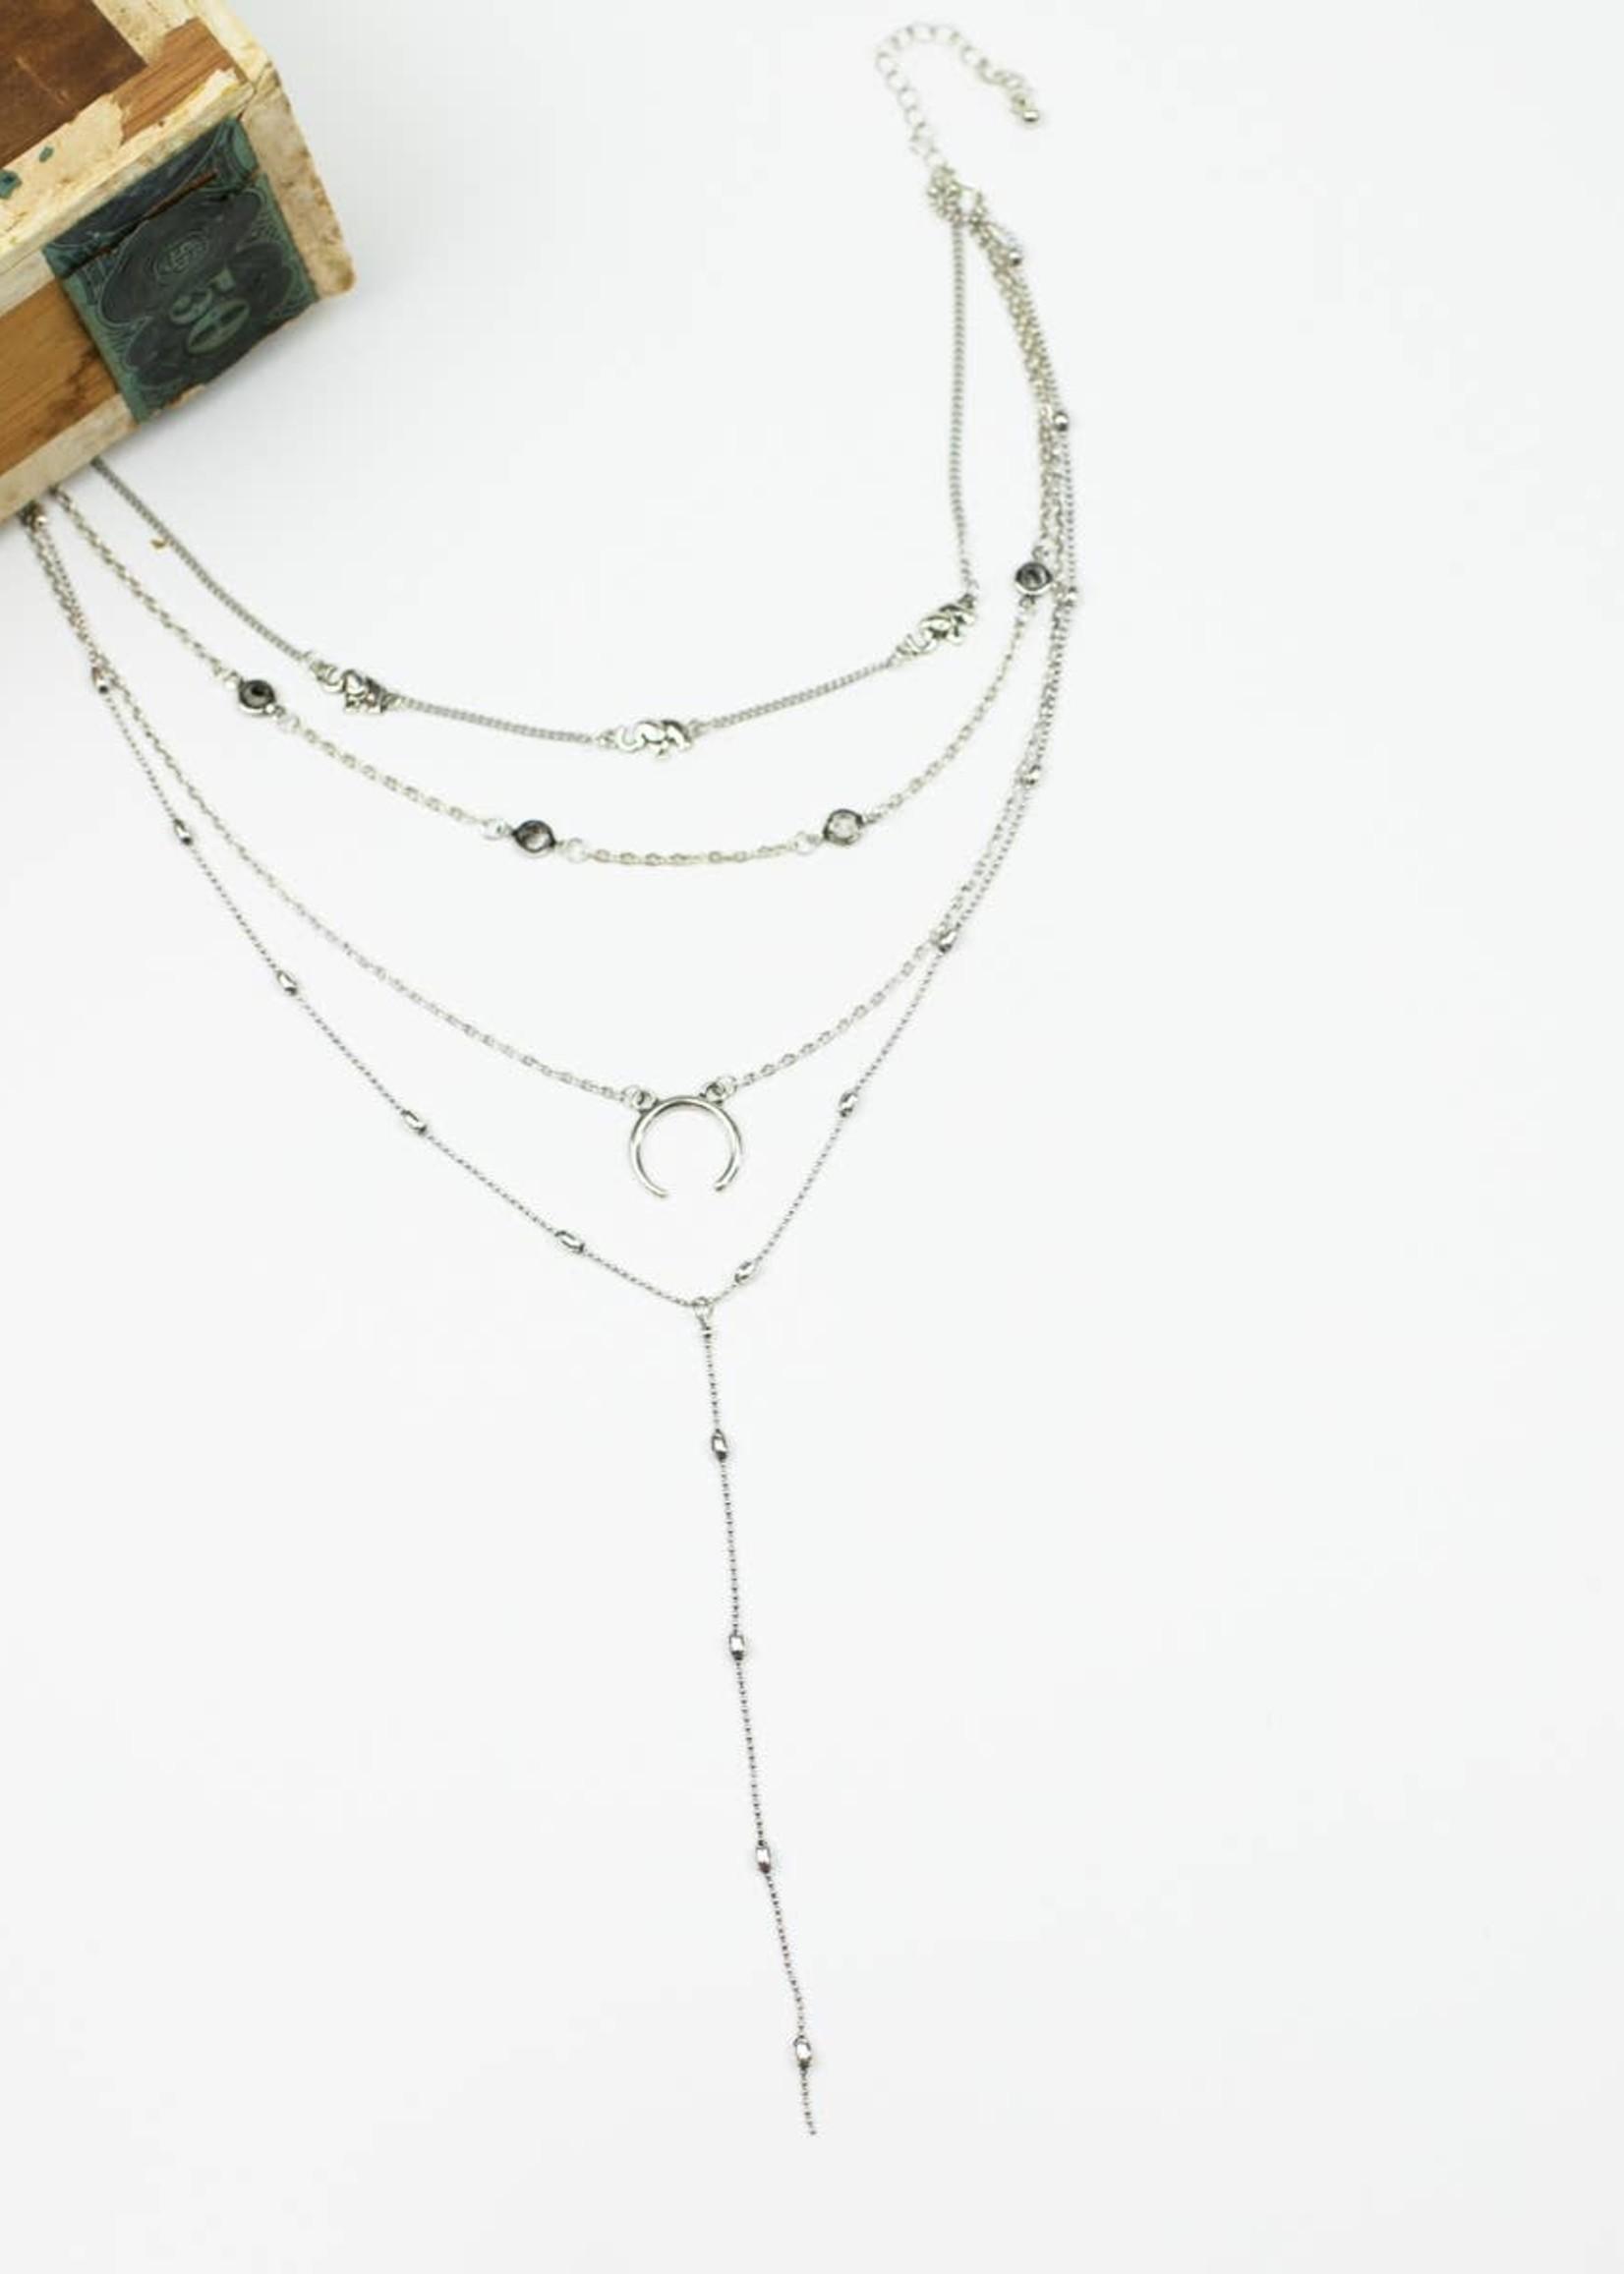 Four Layered Boho Vibe Necklace - Silvertone